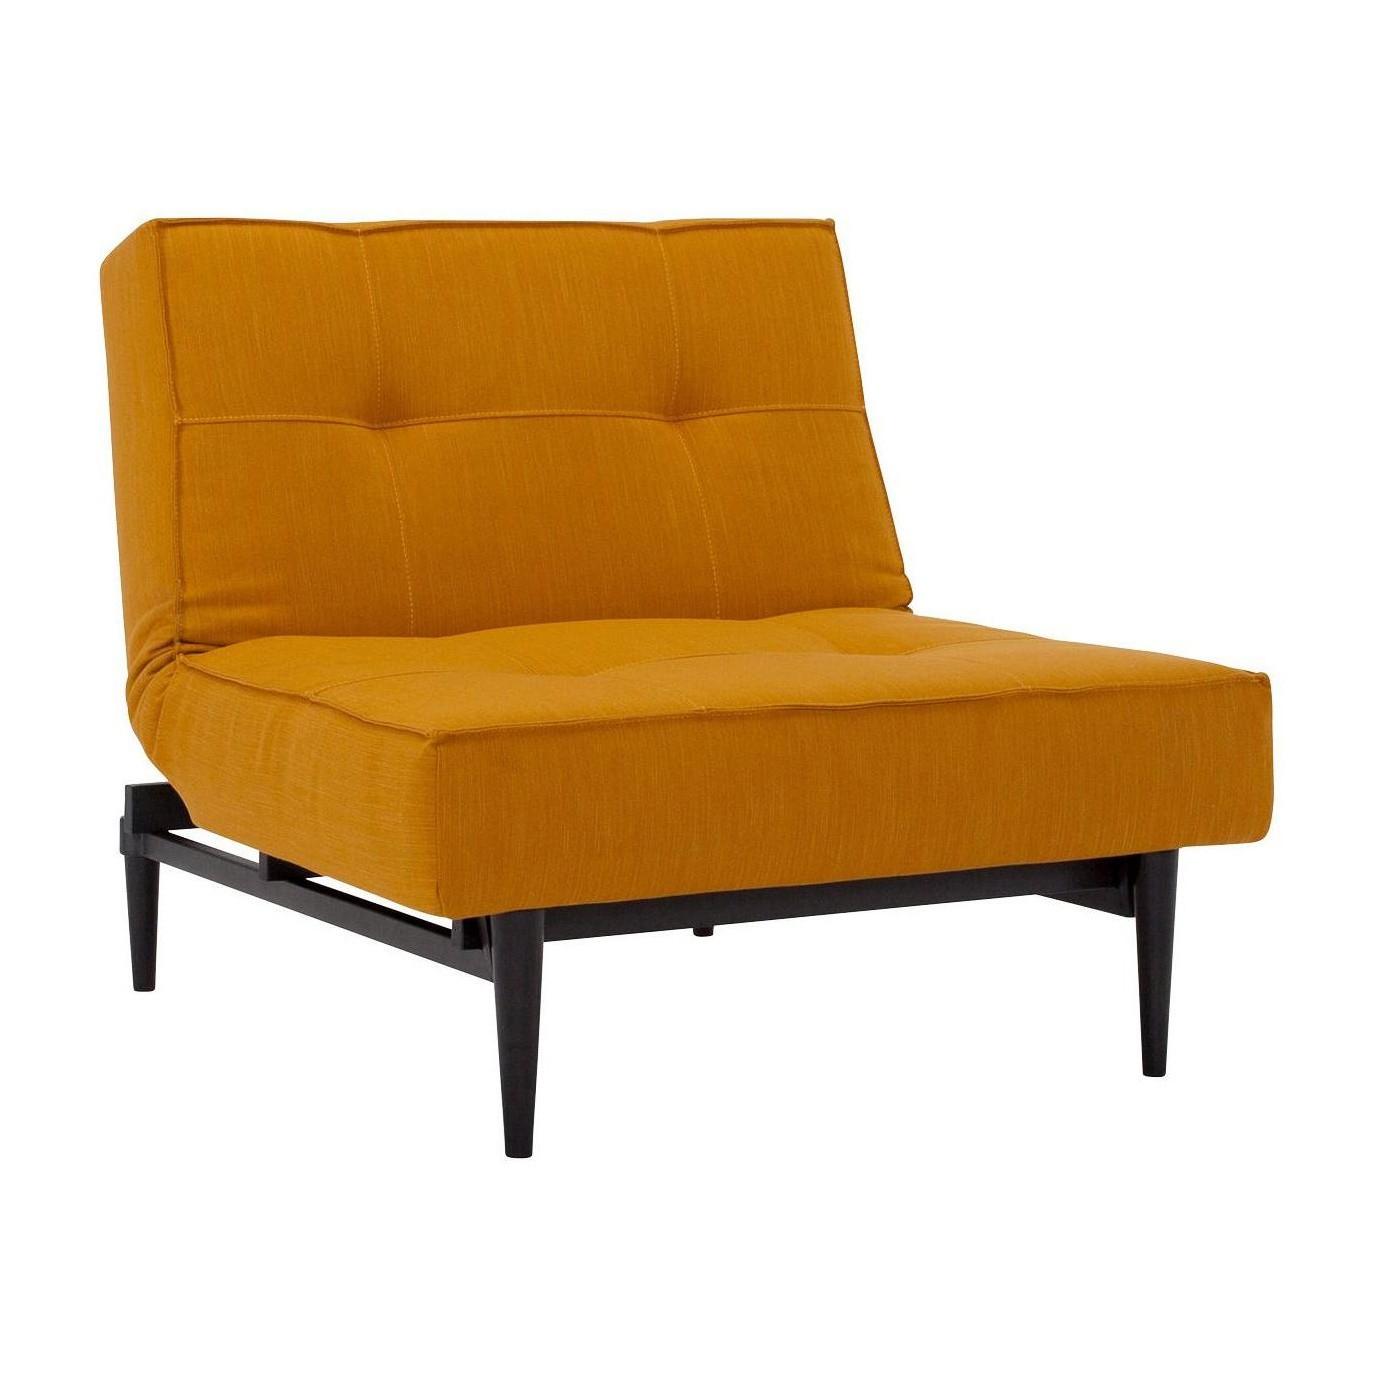 Swell Splitback Styletto Easy Chair Black Wood Inzonedesignstudio Interior Chair Design Inzonedesignstudiocom